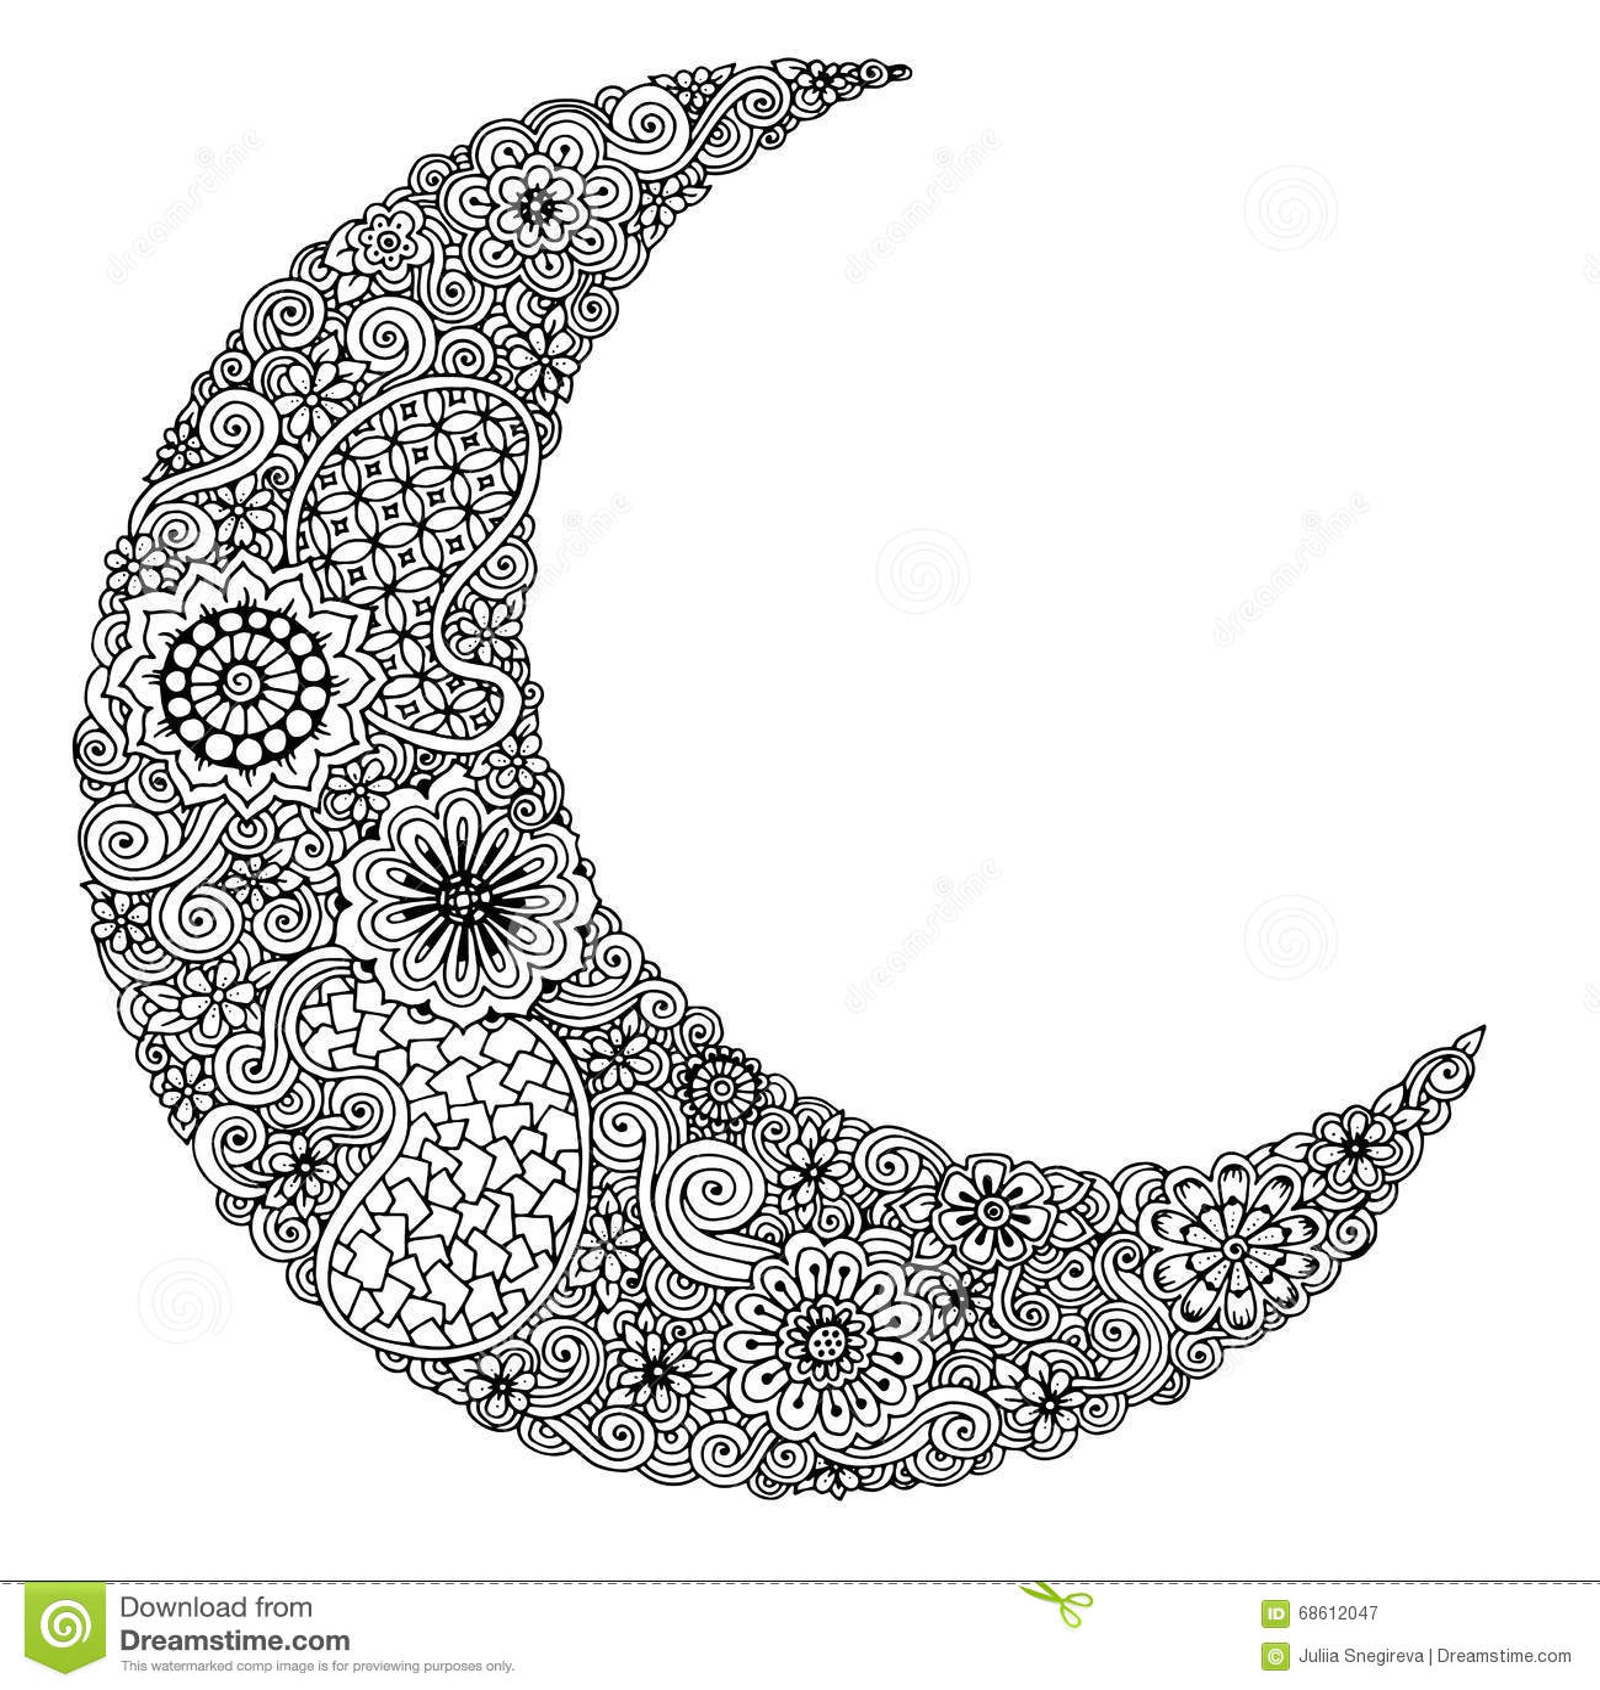 Dorable Coloriage Mandala Loup Lune Motif - Printable Coloring Pages ...